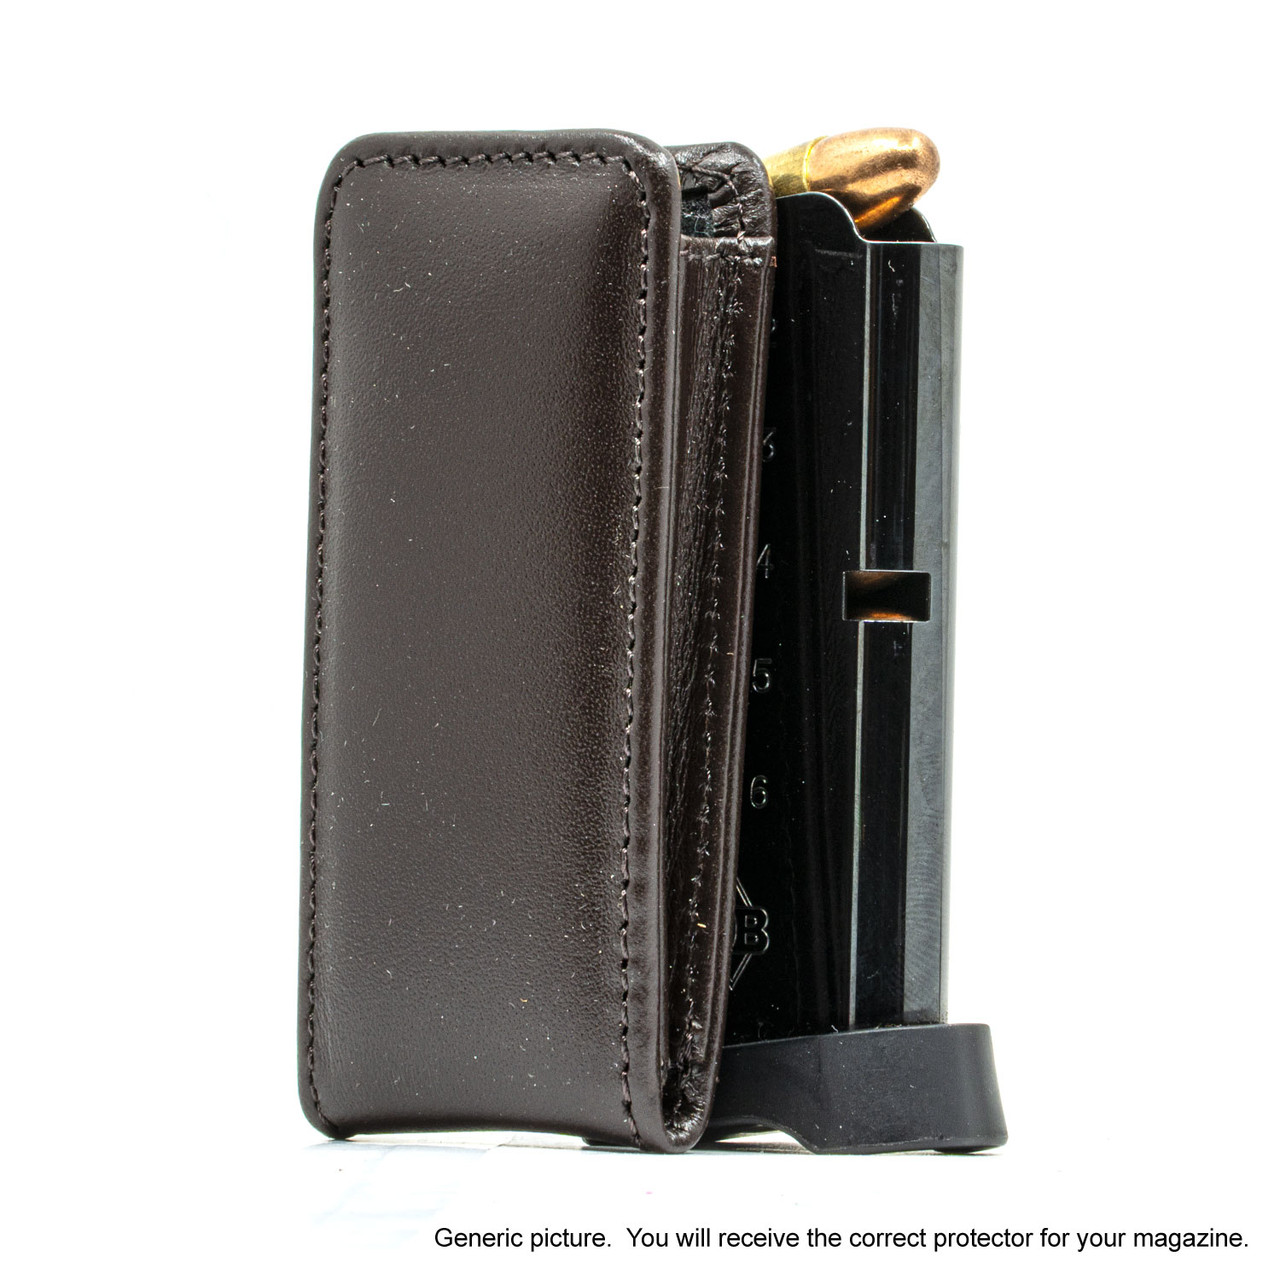 Kahr MK9 Brown Leather Magazine Pocket Protector